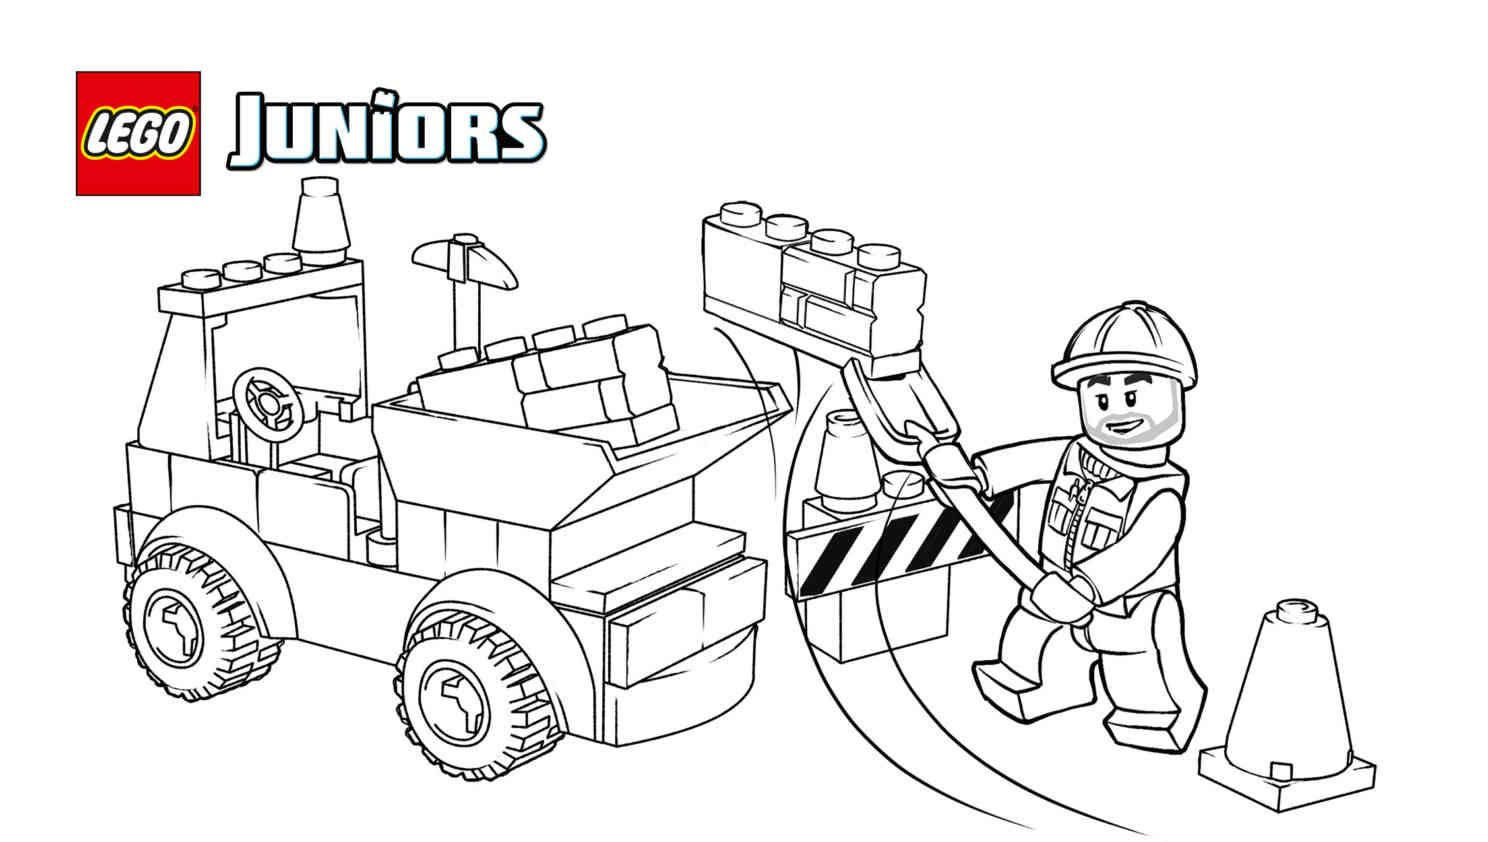 Lego Juniors Construction 3 Coloring Sheet